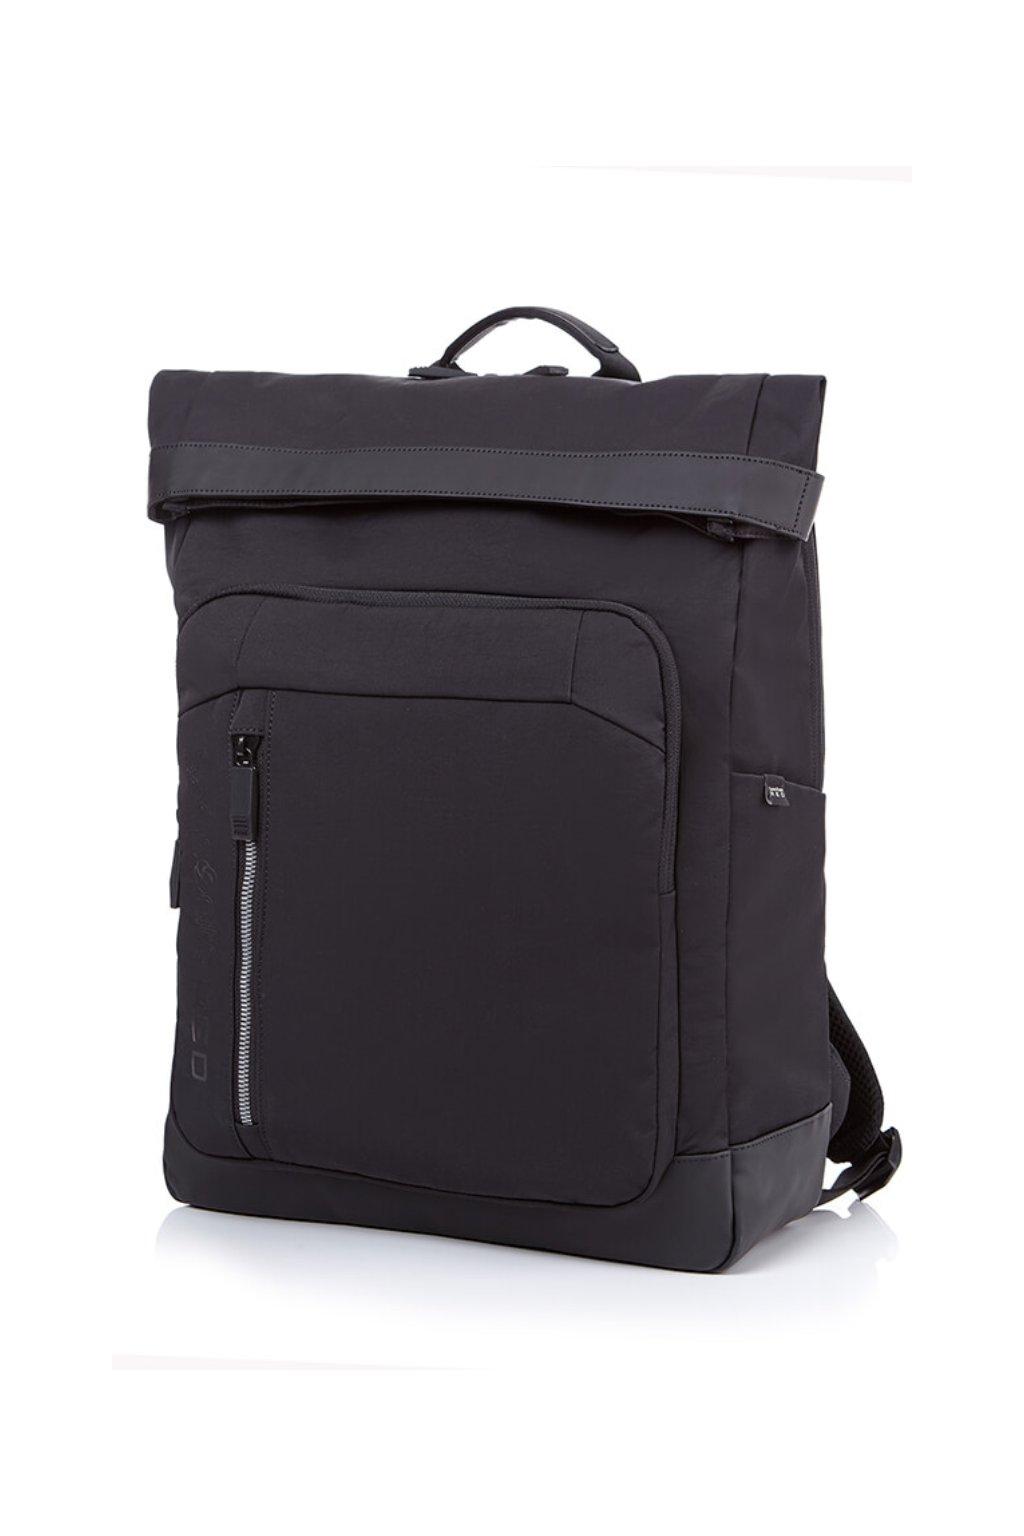 kufrland samsonite ruon flac backpack black (1)